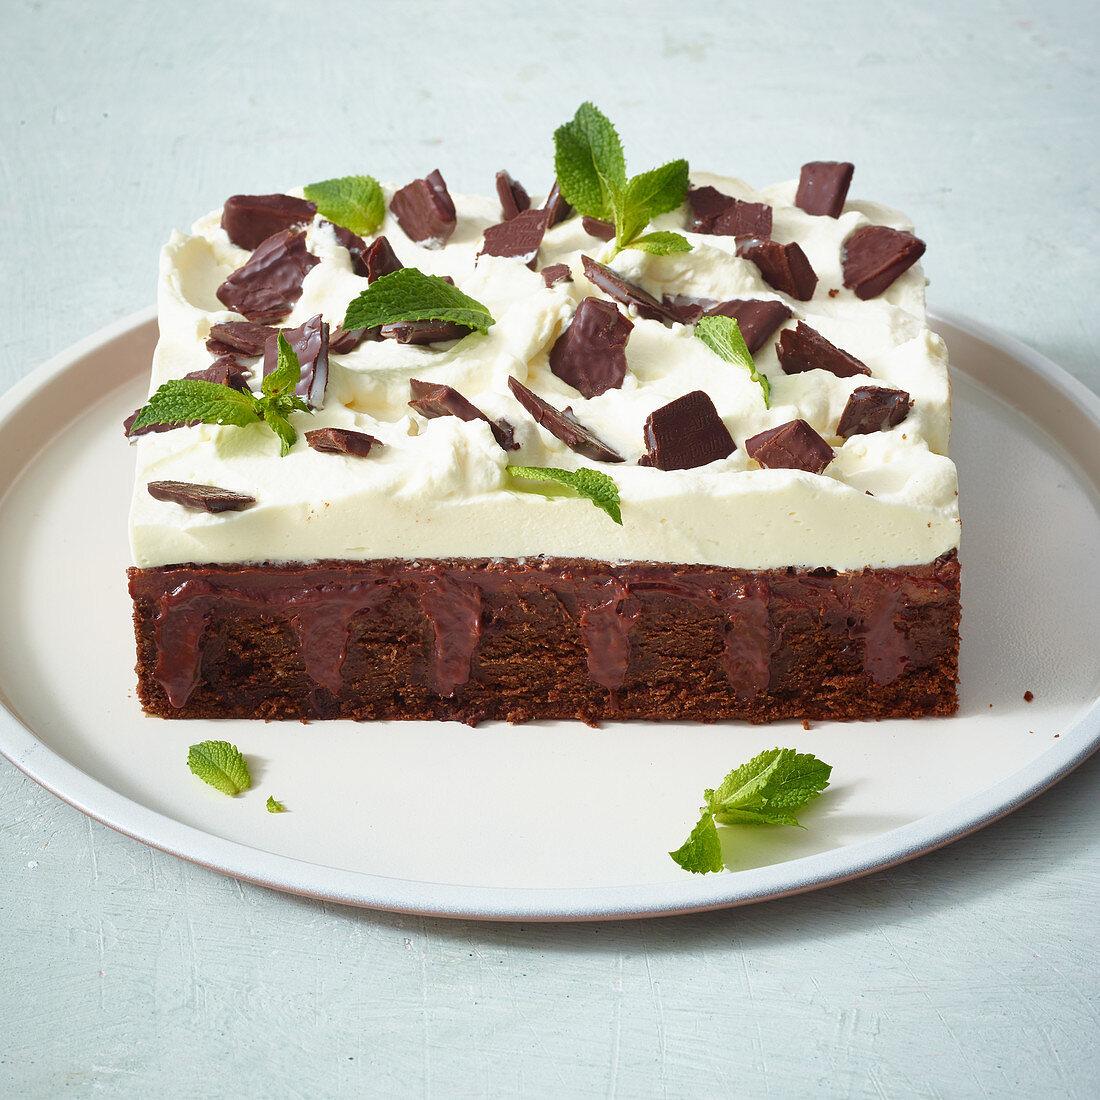 Mint chocolate poke cake